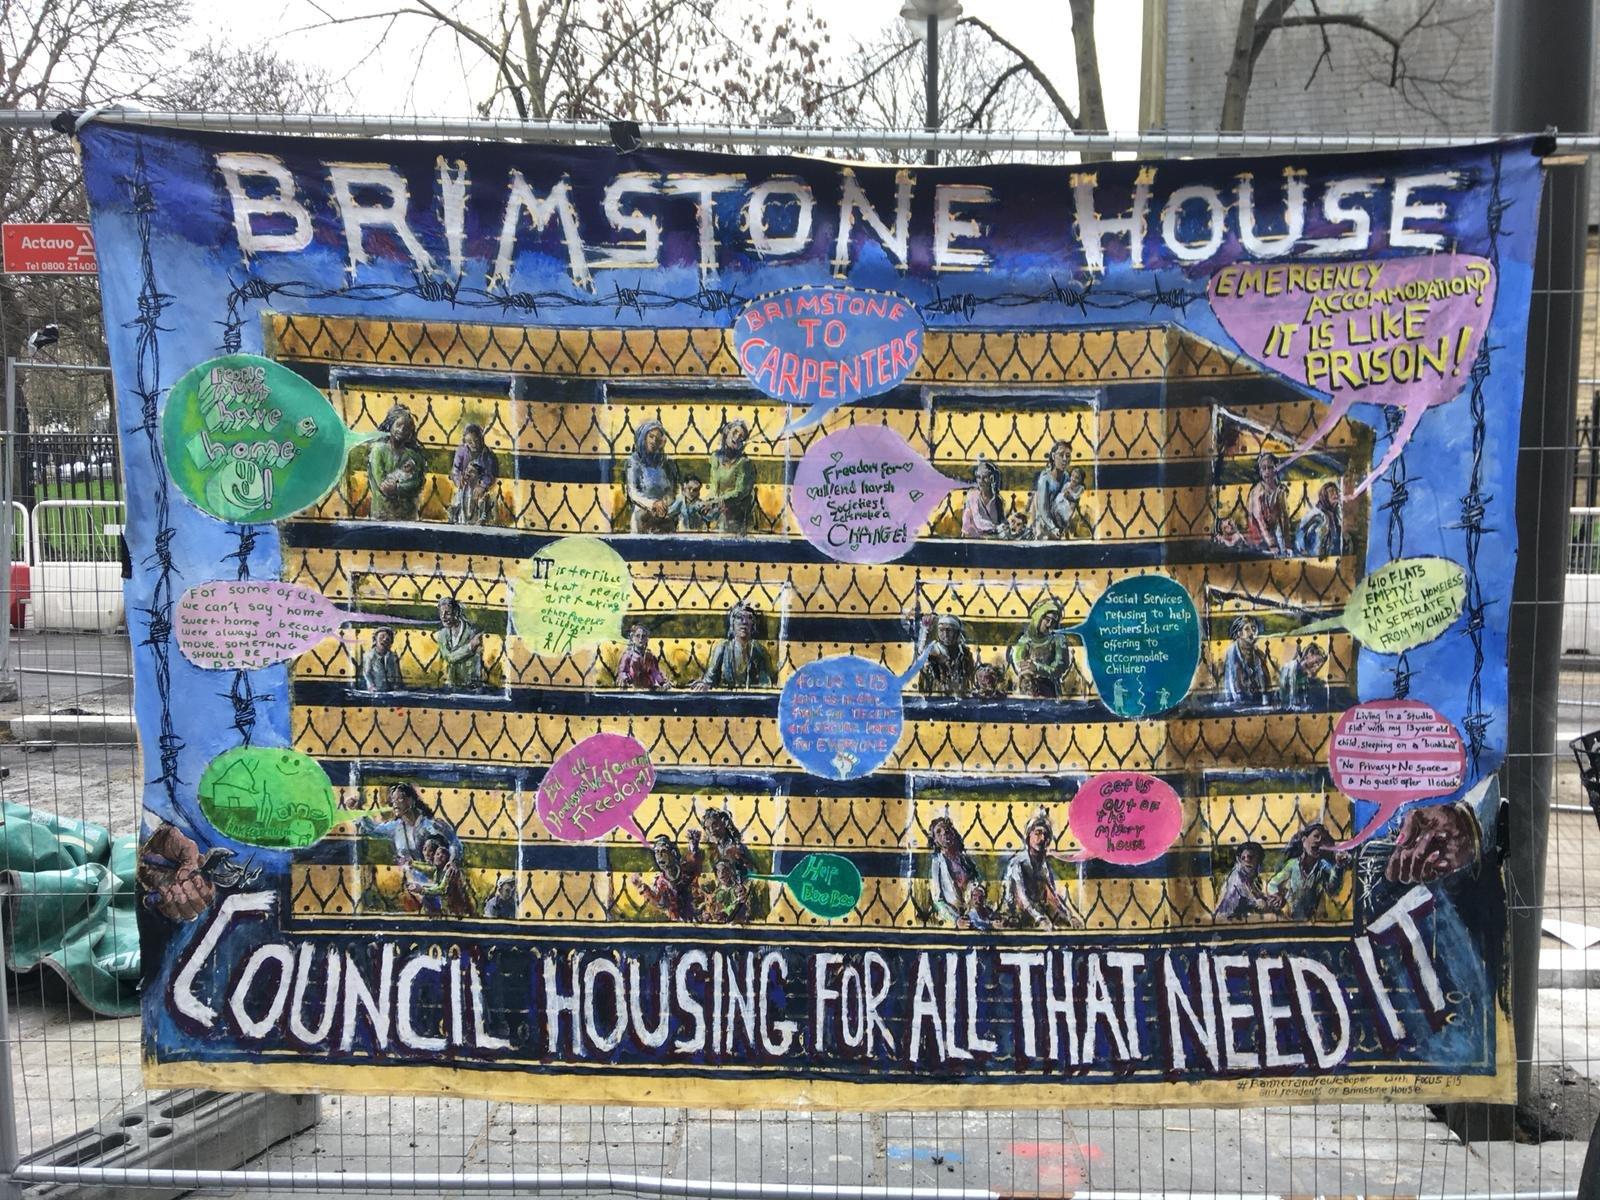 Focus E15 Campaign | Social Housing not Social Cleansing!